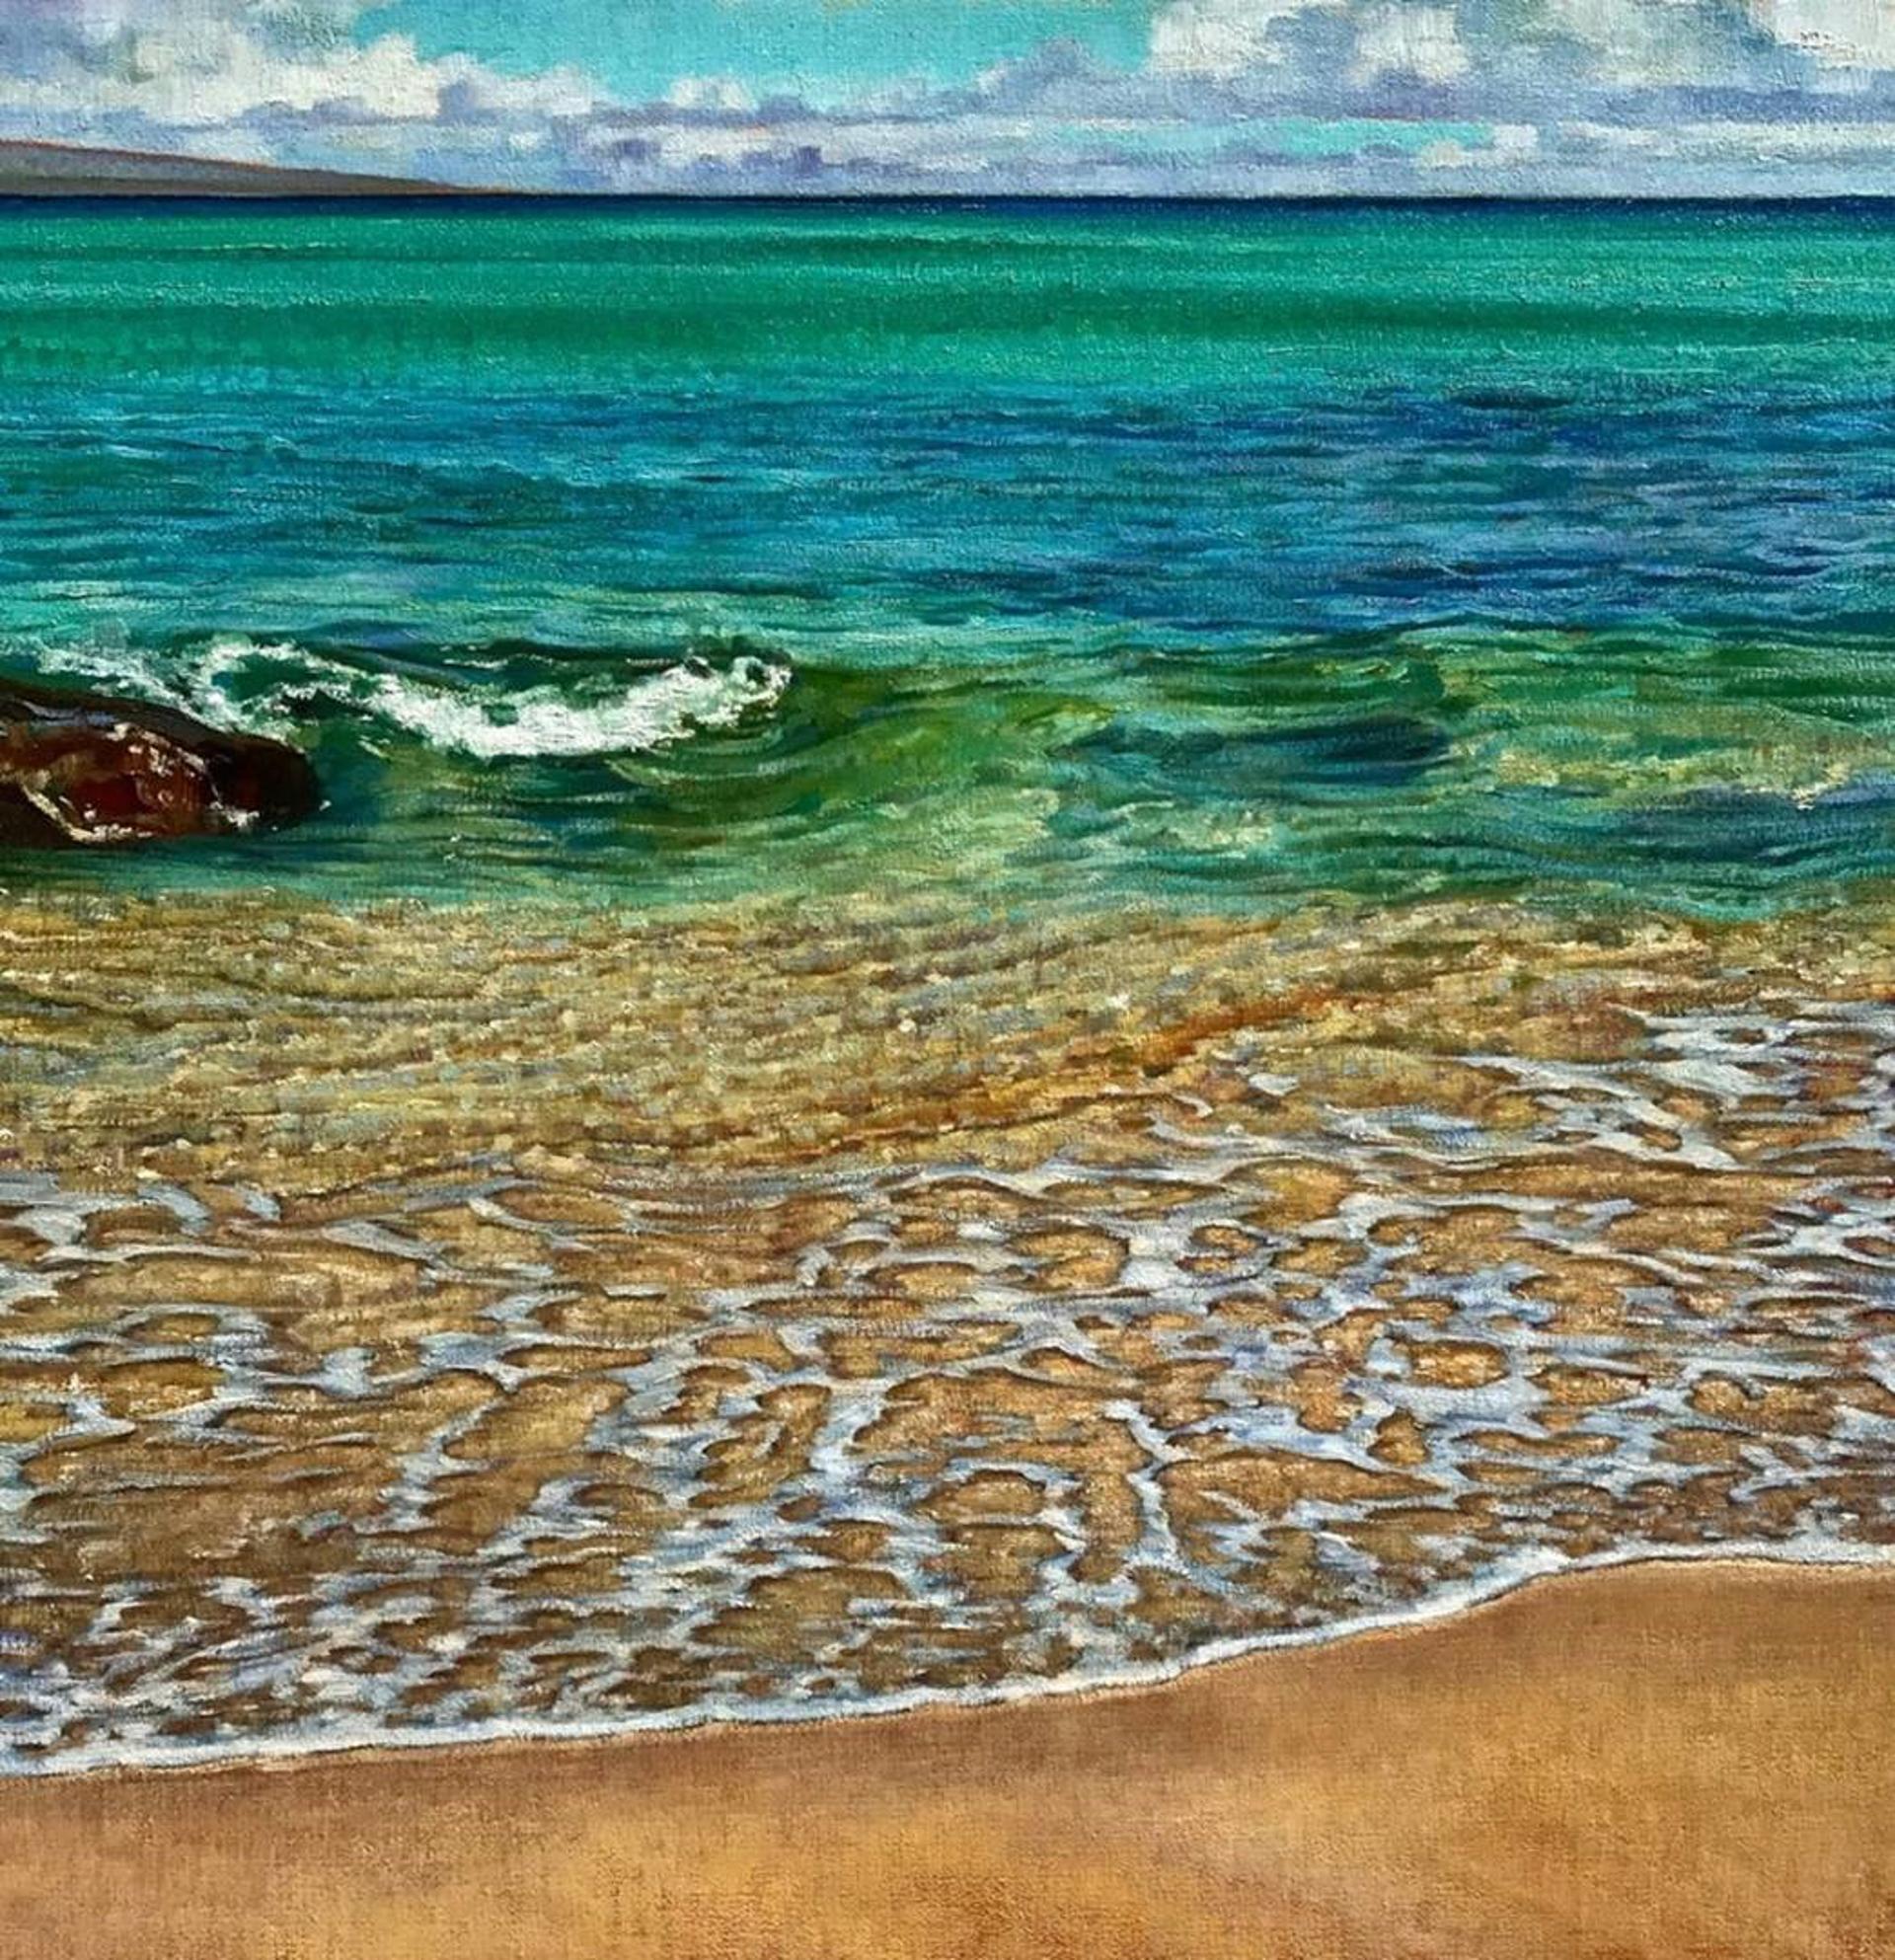 Maui Beach Morning Tide by Caroline Zimmermann